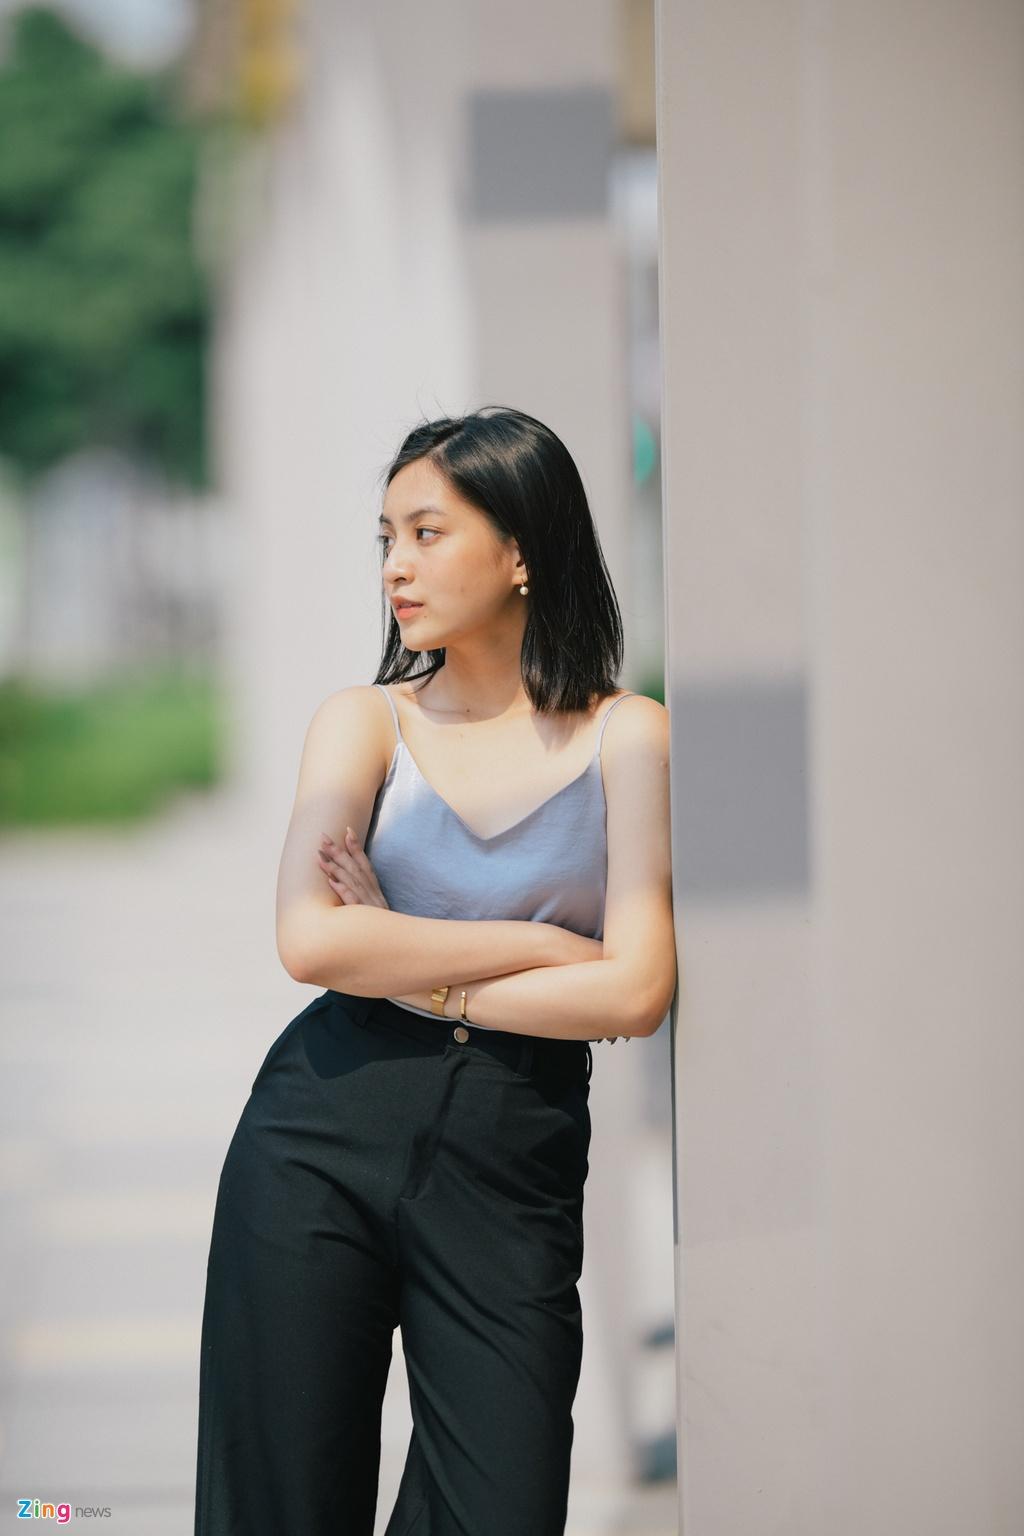 Nhan sac doi thuong cua Tra Long va Hong IELTS 8.5 hinh anh 19 matbiec13_zing.jpg